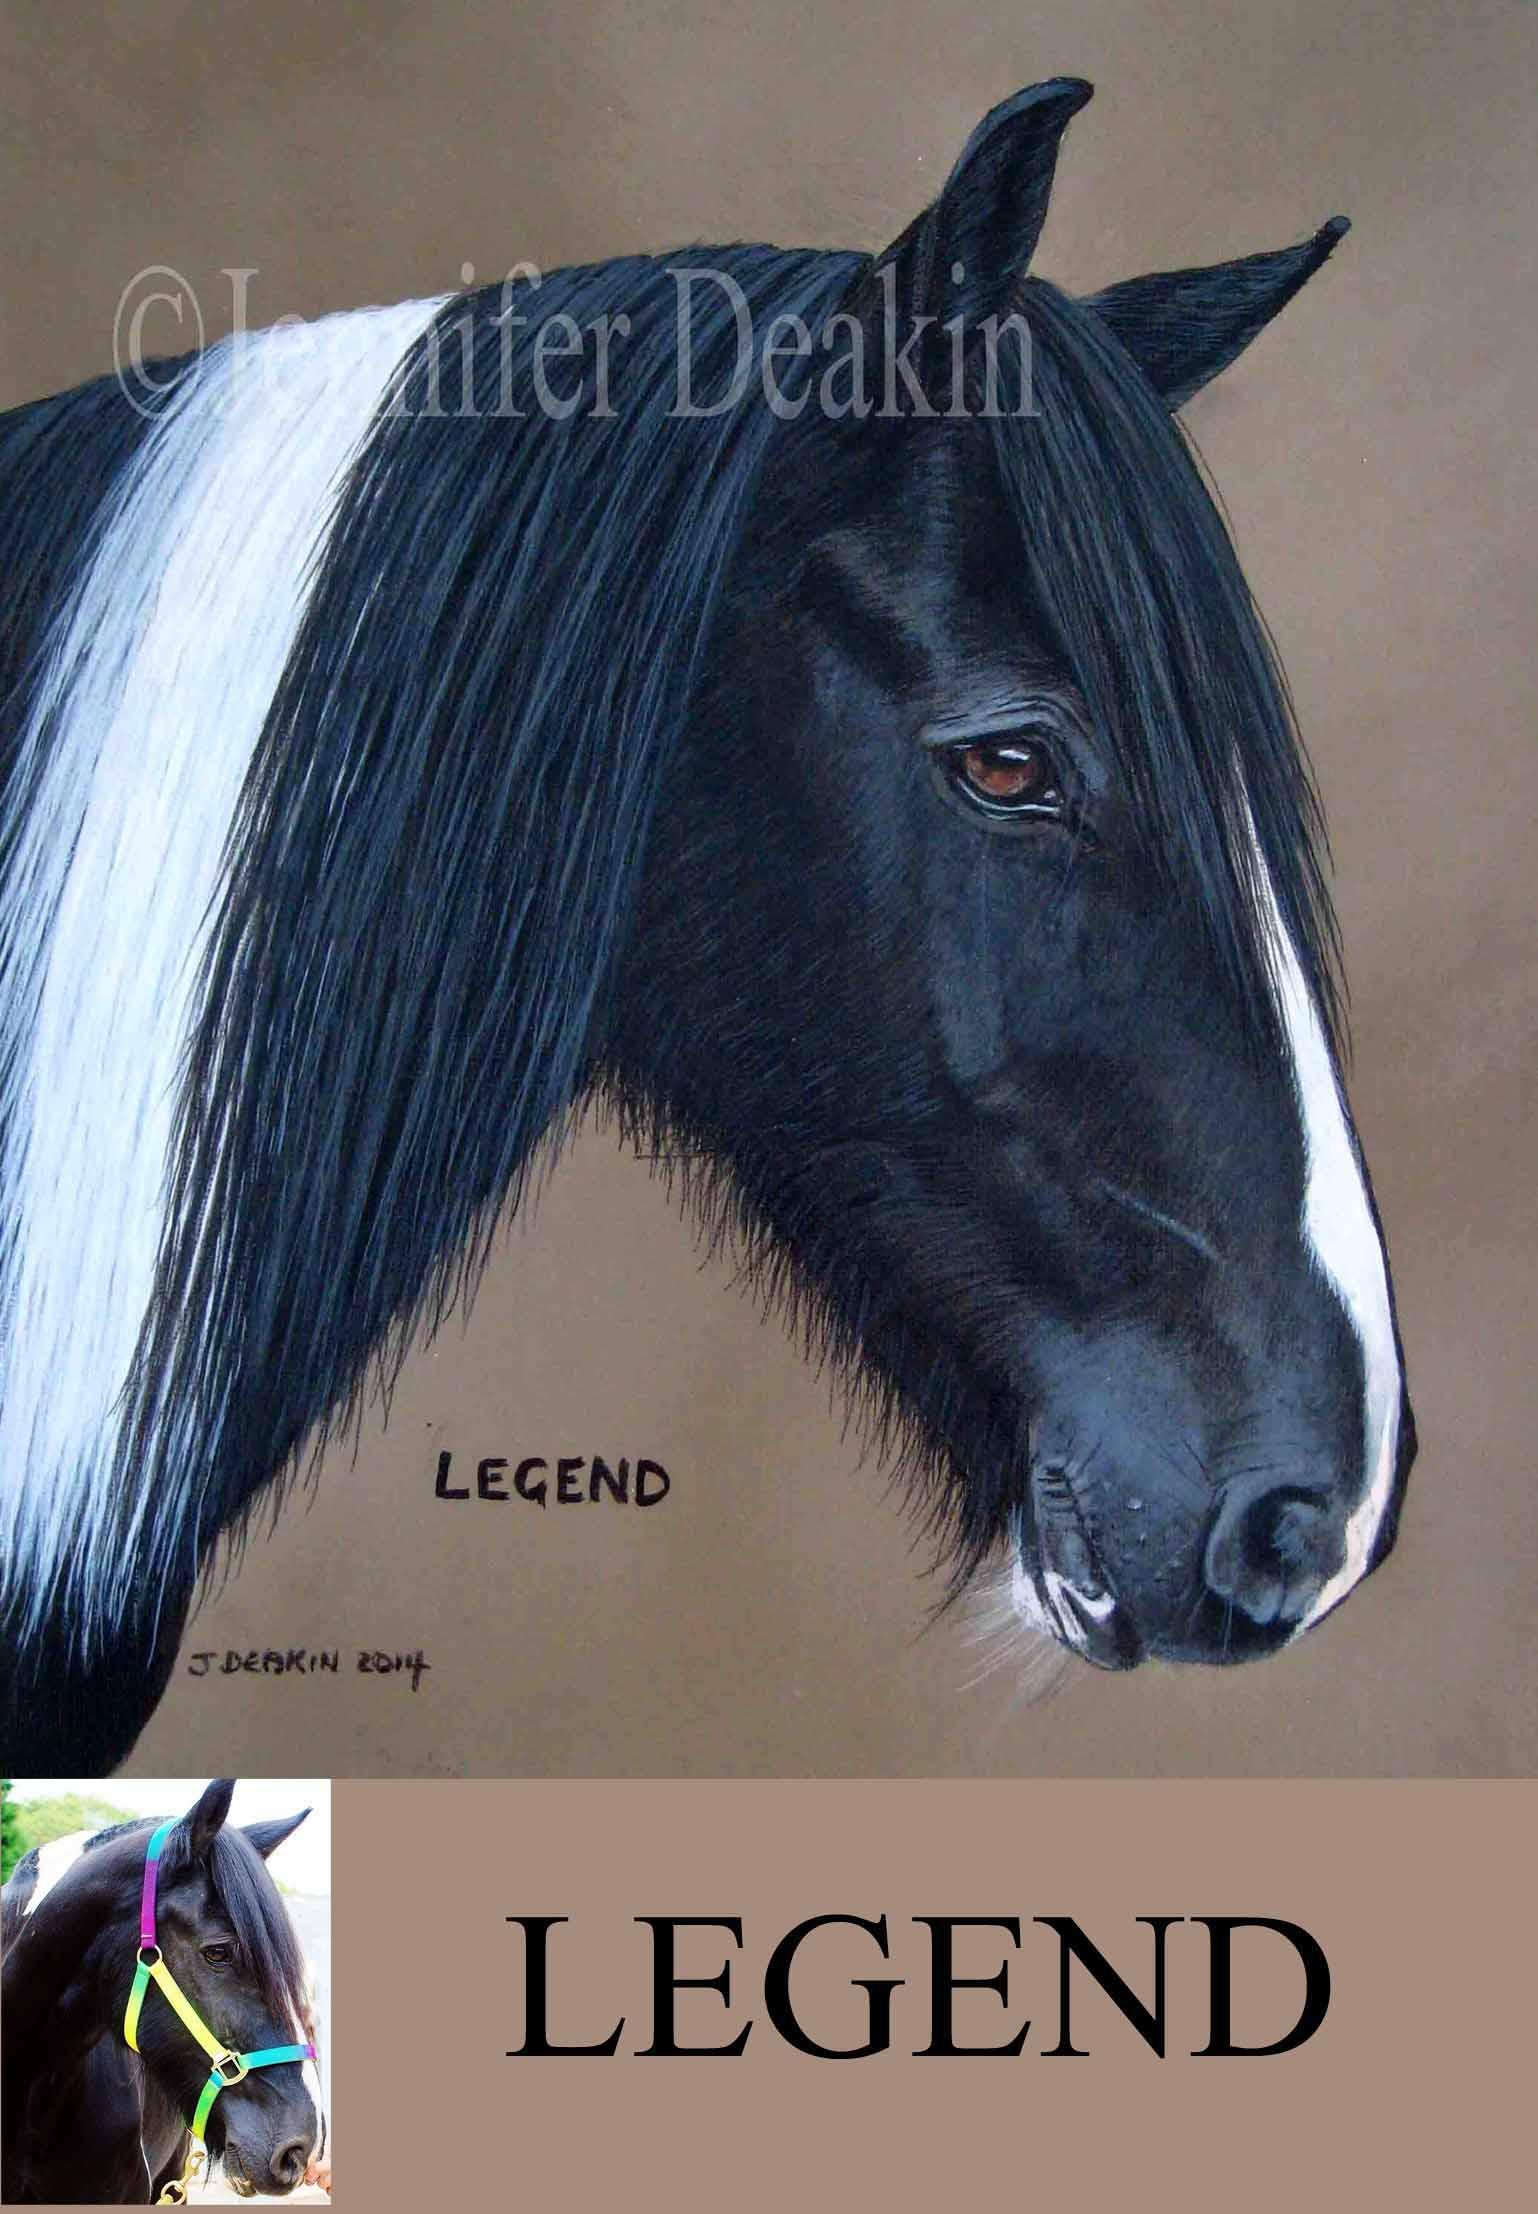 colouredhorse